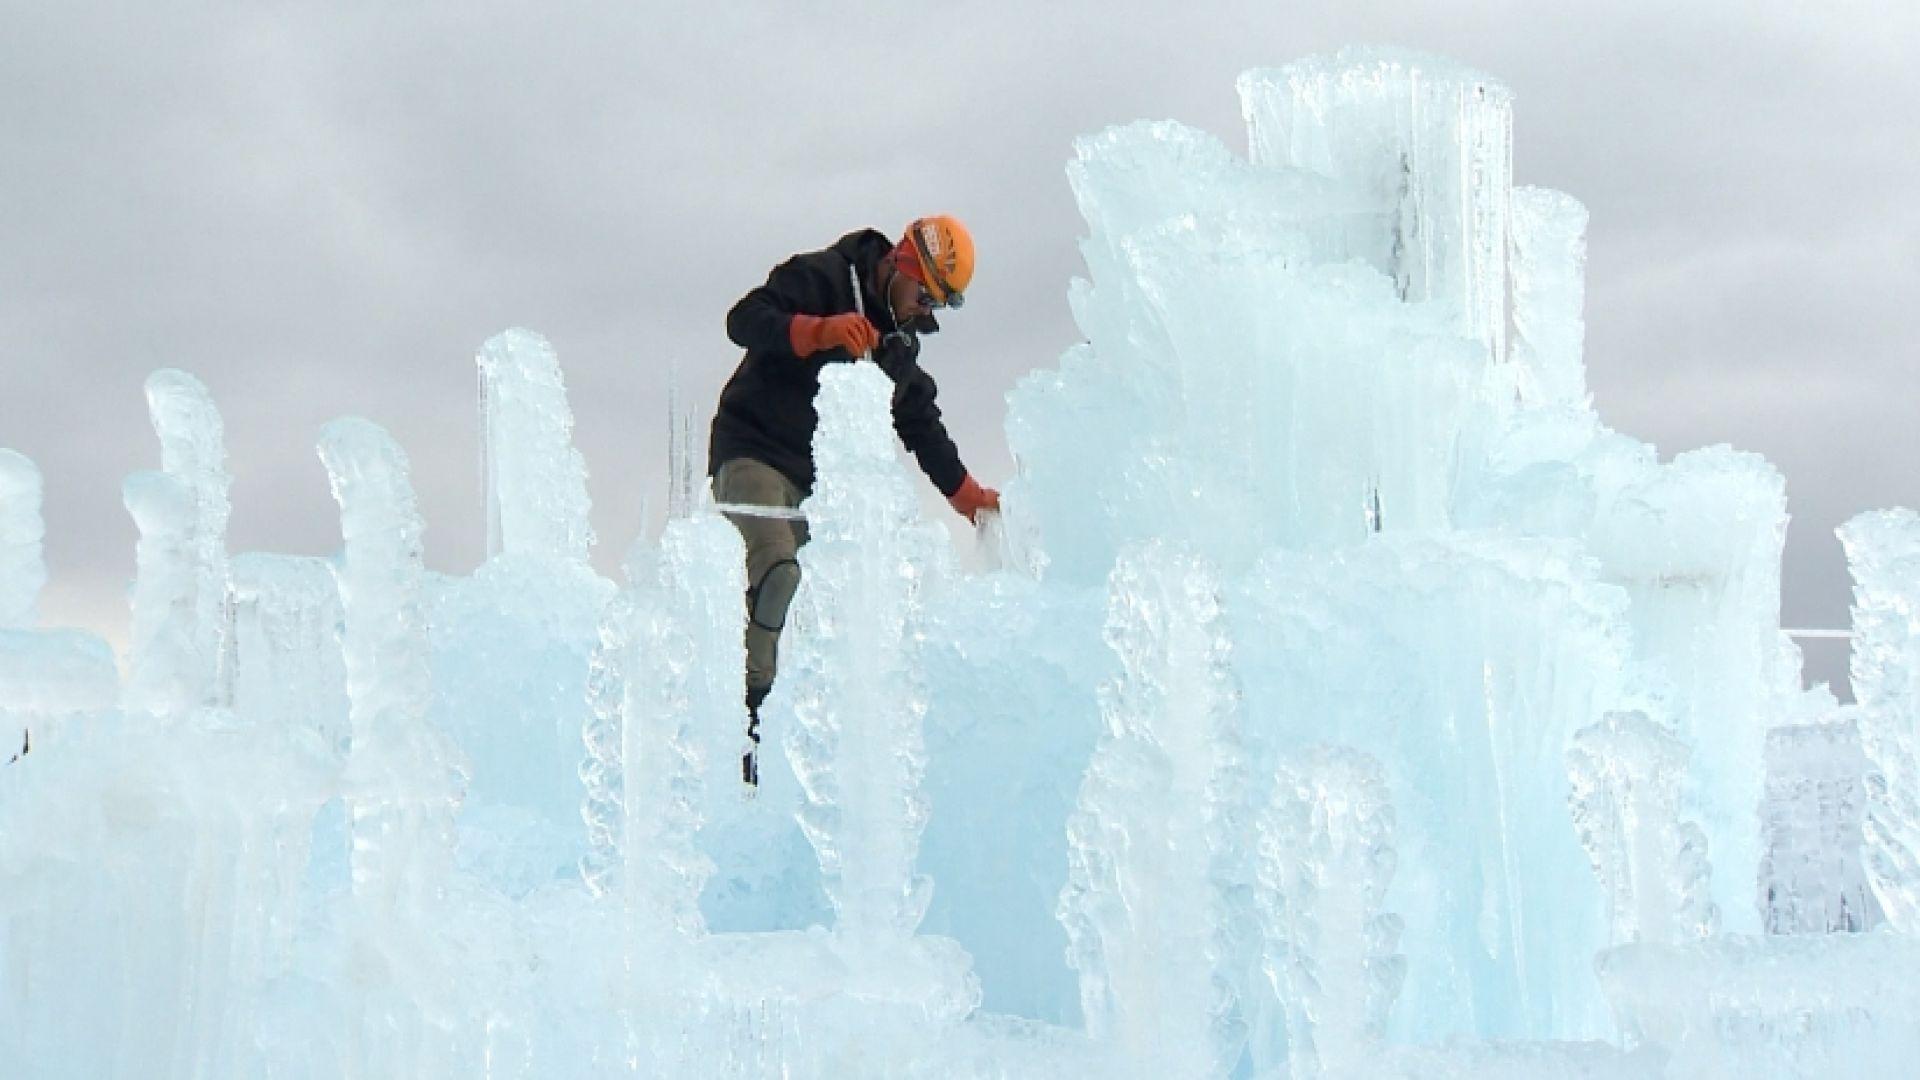 Ice castle in Dillon, Co